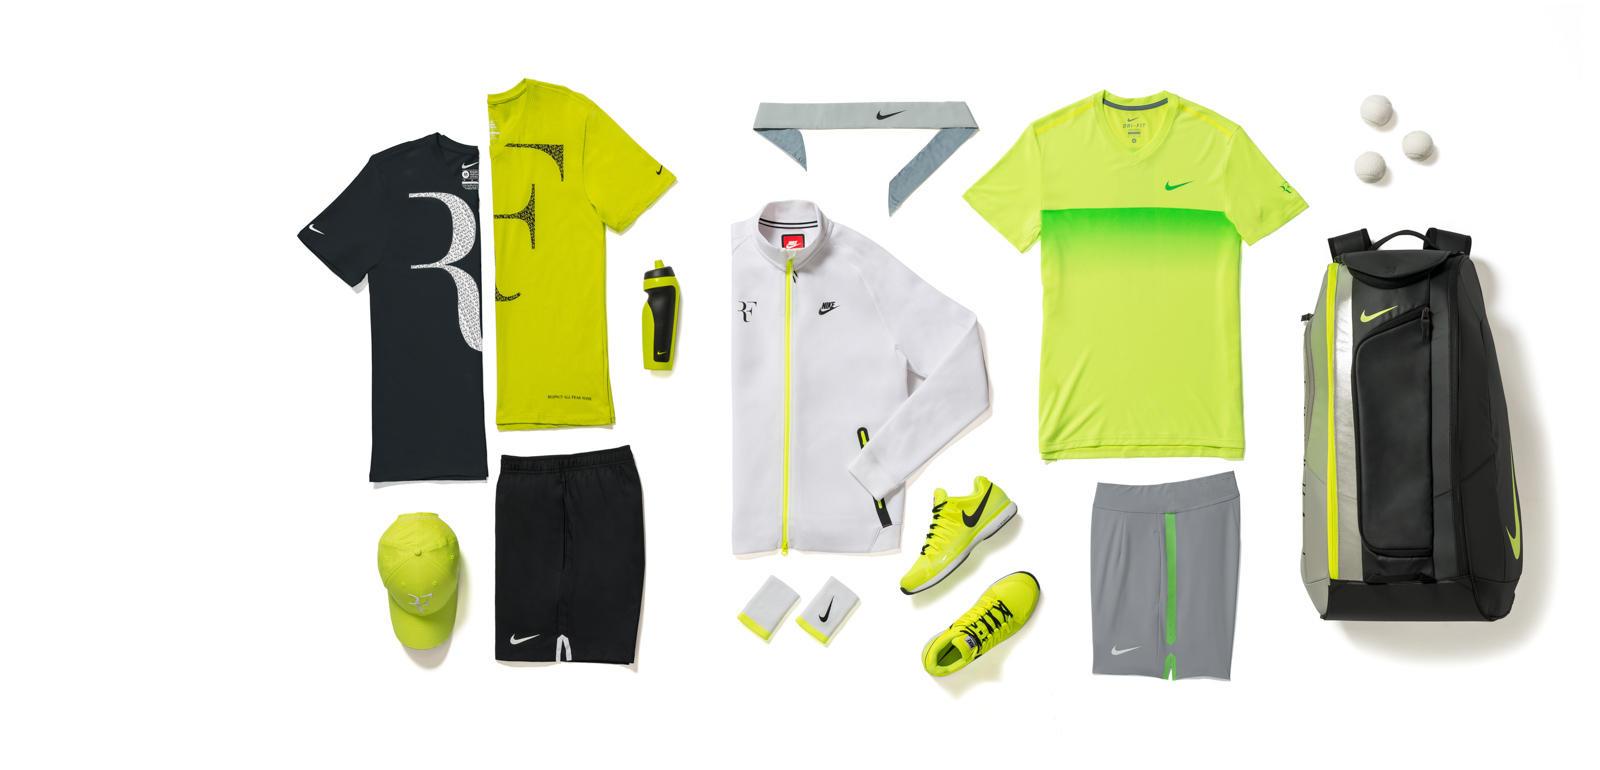 Open d'Australie 2015 - Tenue Roger Federer (Nike tennis outfit)